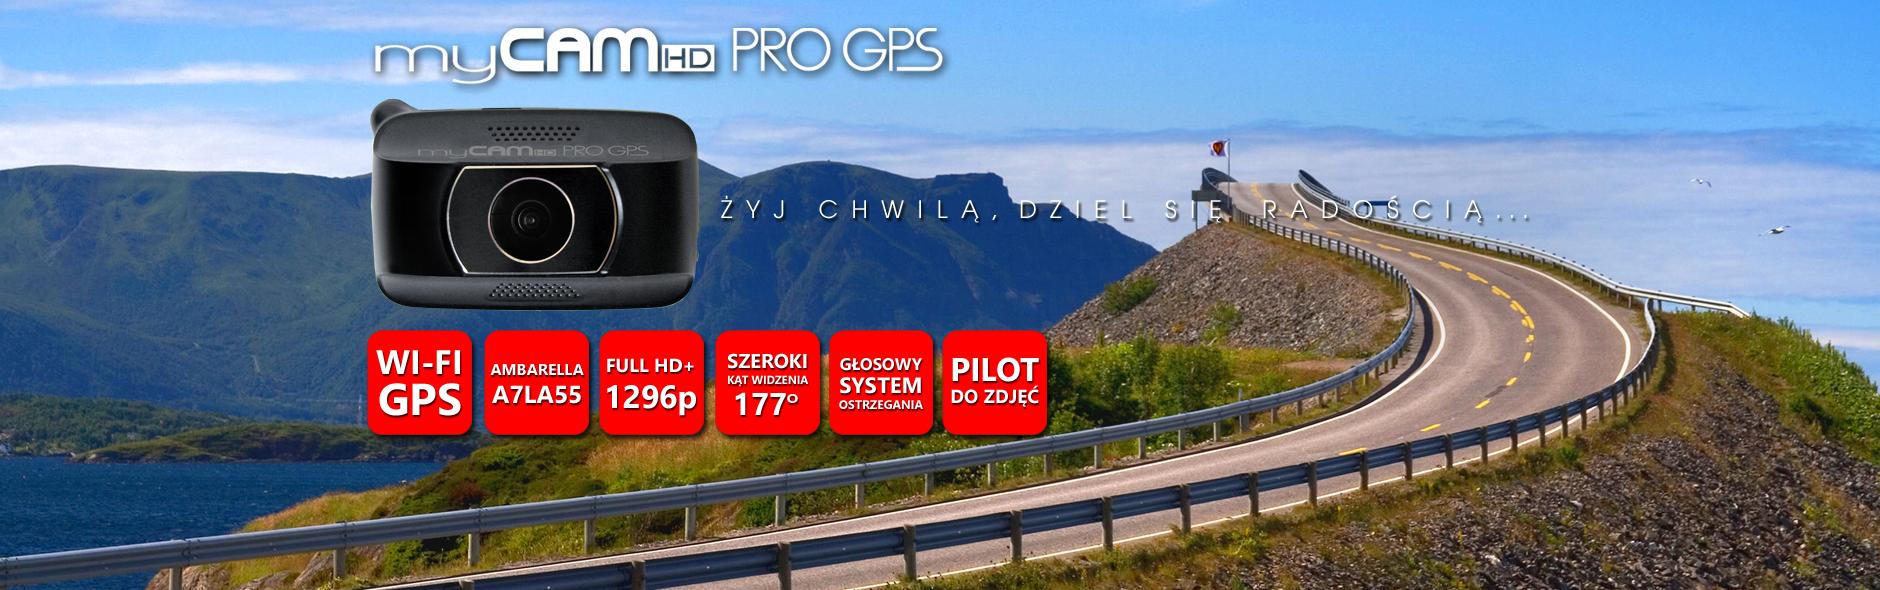 myCAM HD PRO GPS_banner_OK